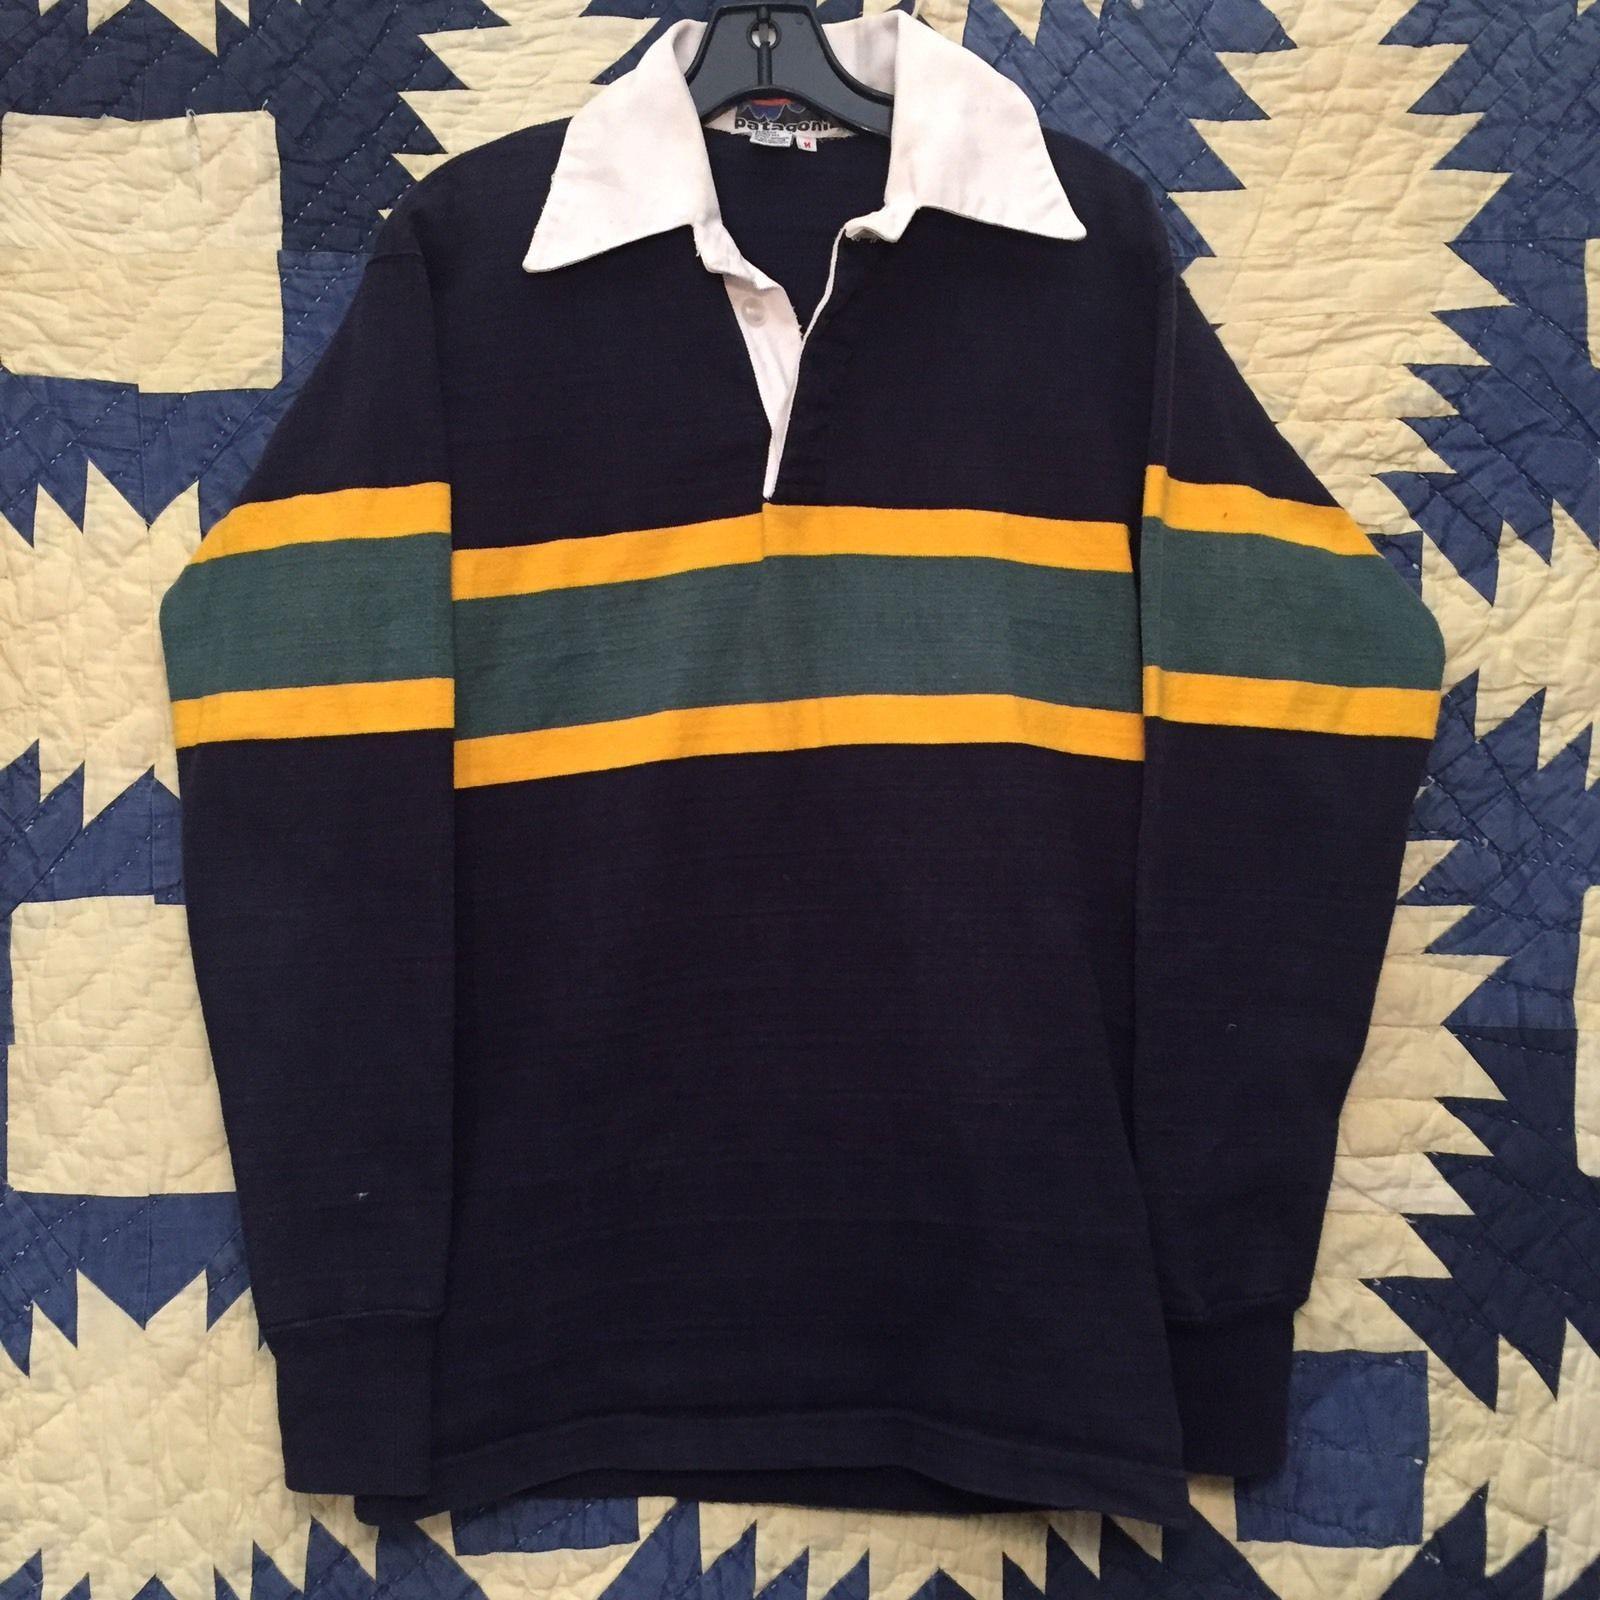 Rare Vintage 1970s Patagonia Rugby Climbing Shirt Mens Size Small Mens Shirts Weird Shirts Casual Tops